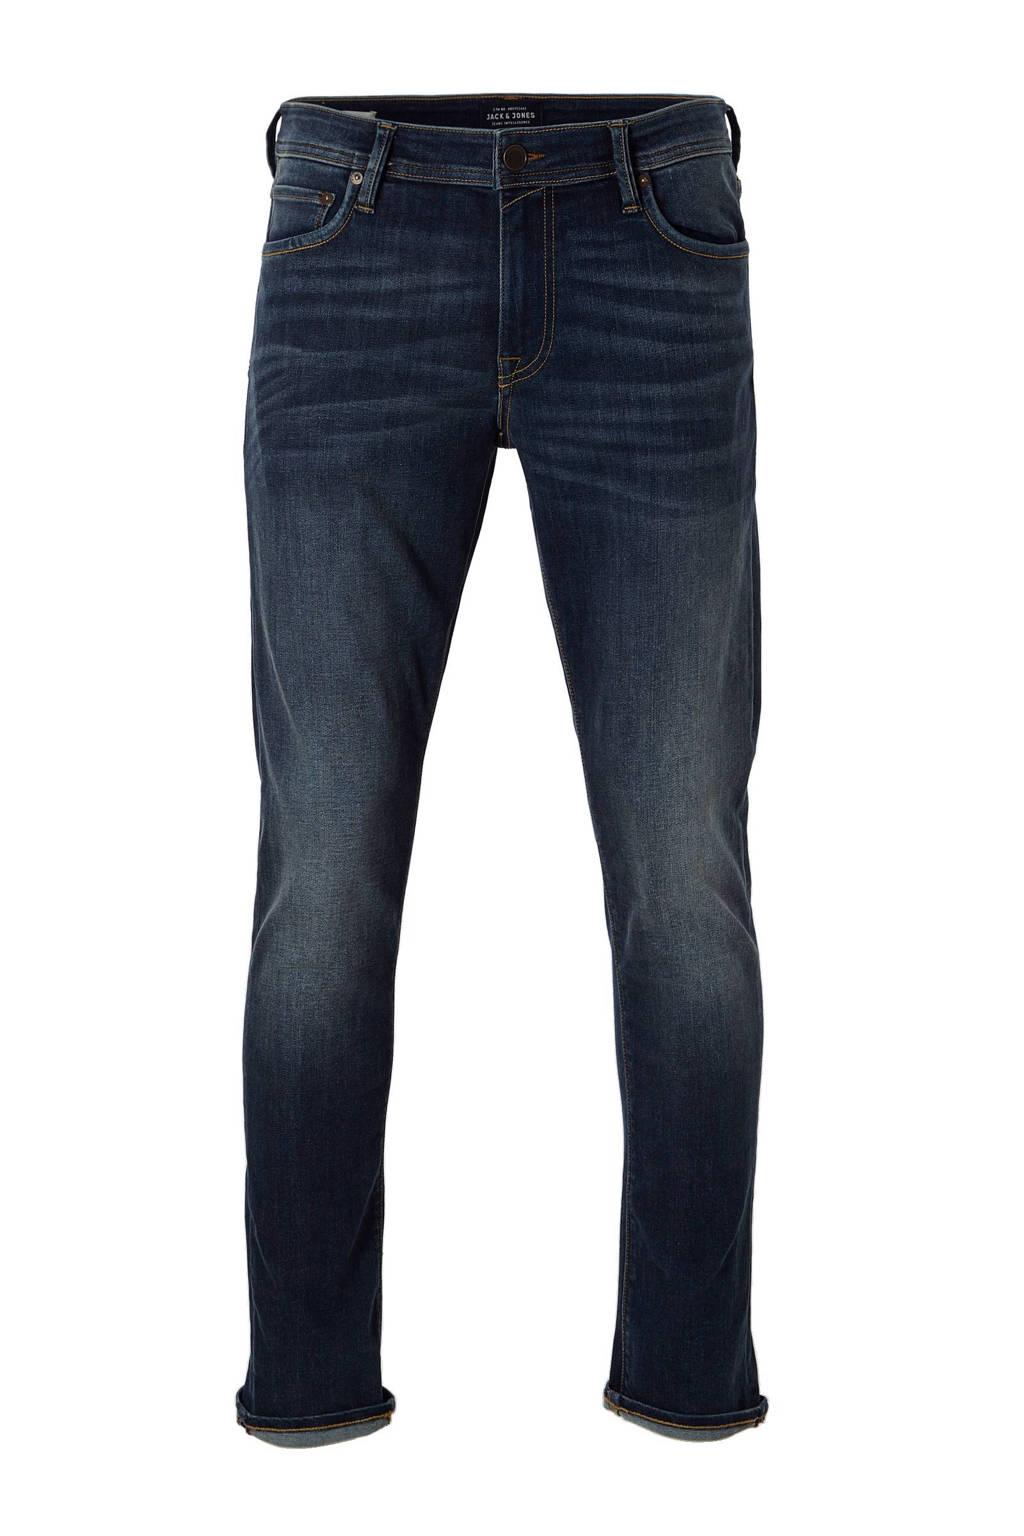 JACK & JONES slim fit jeans Glenn, 743 Blue Denim